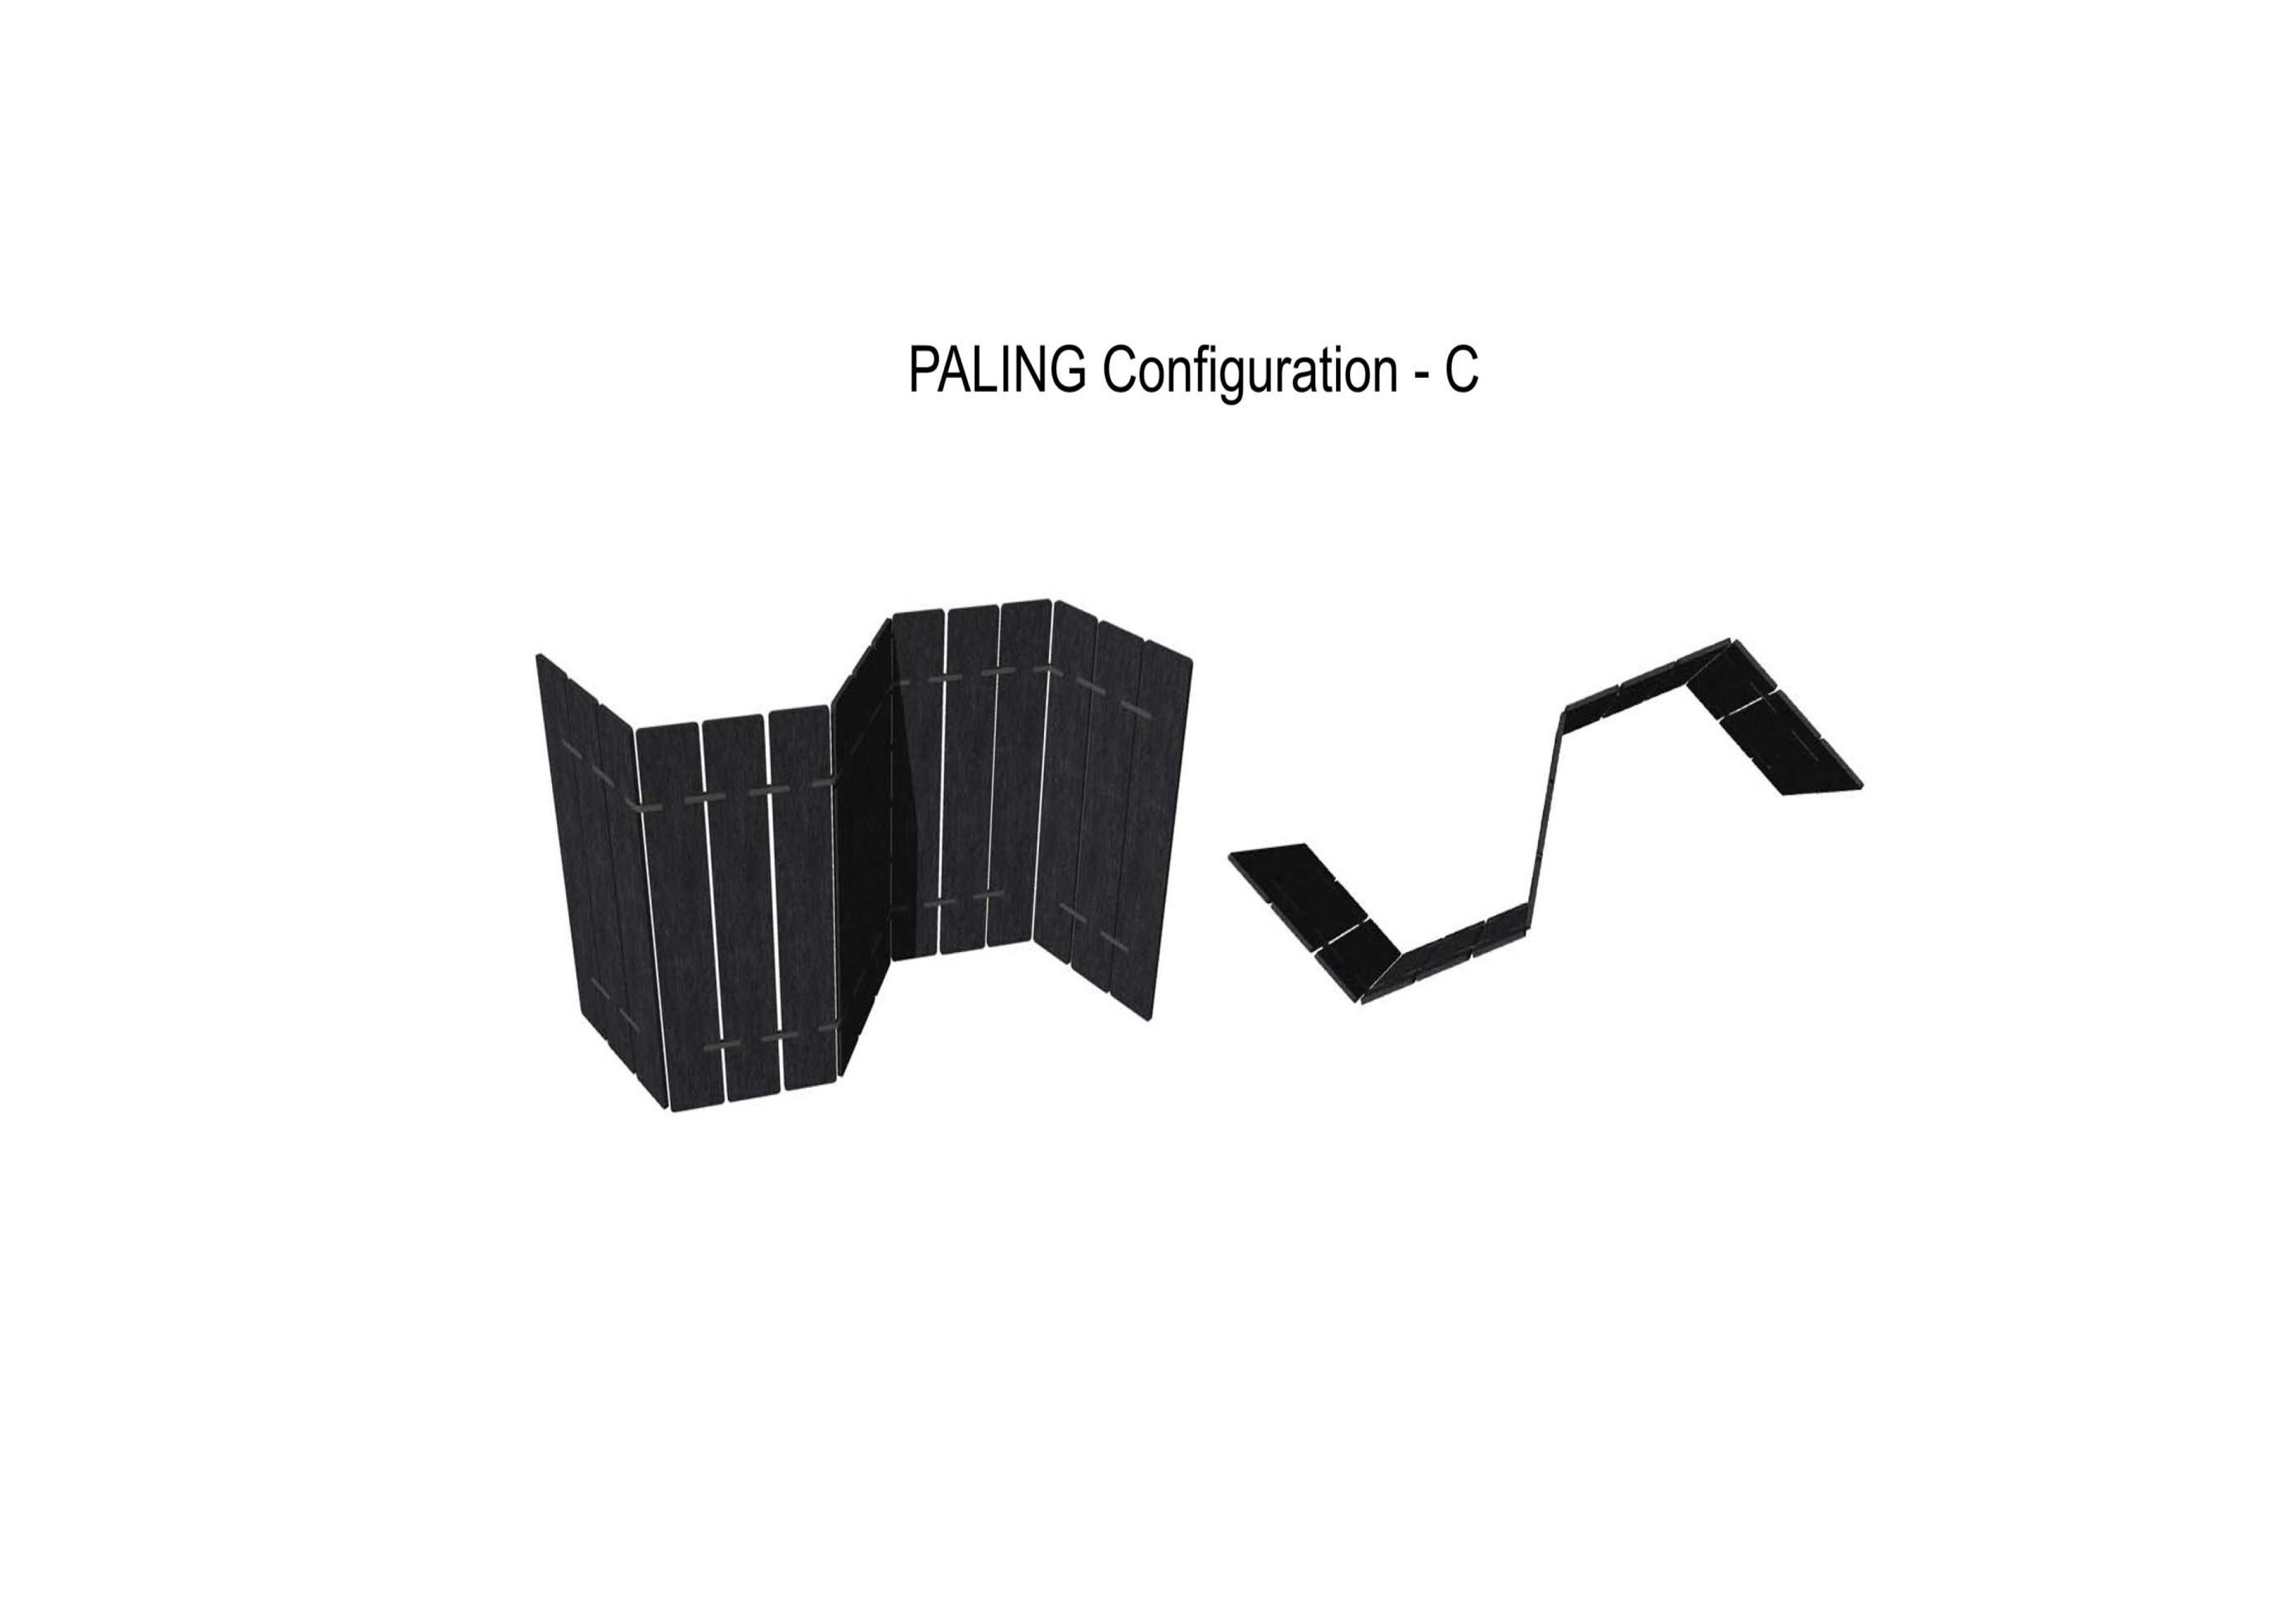 Paling configuration 3